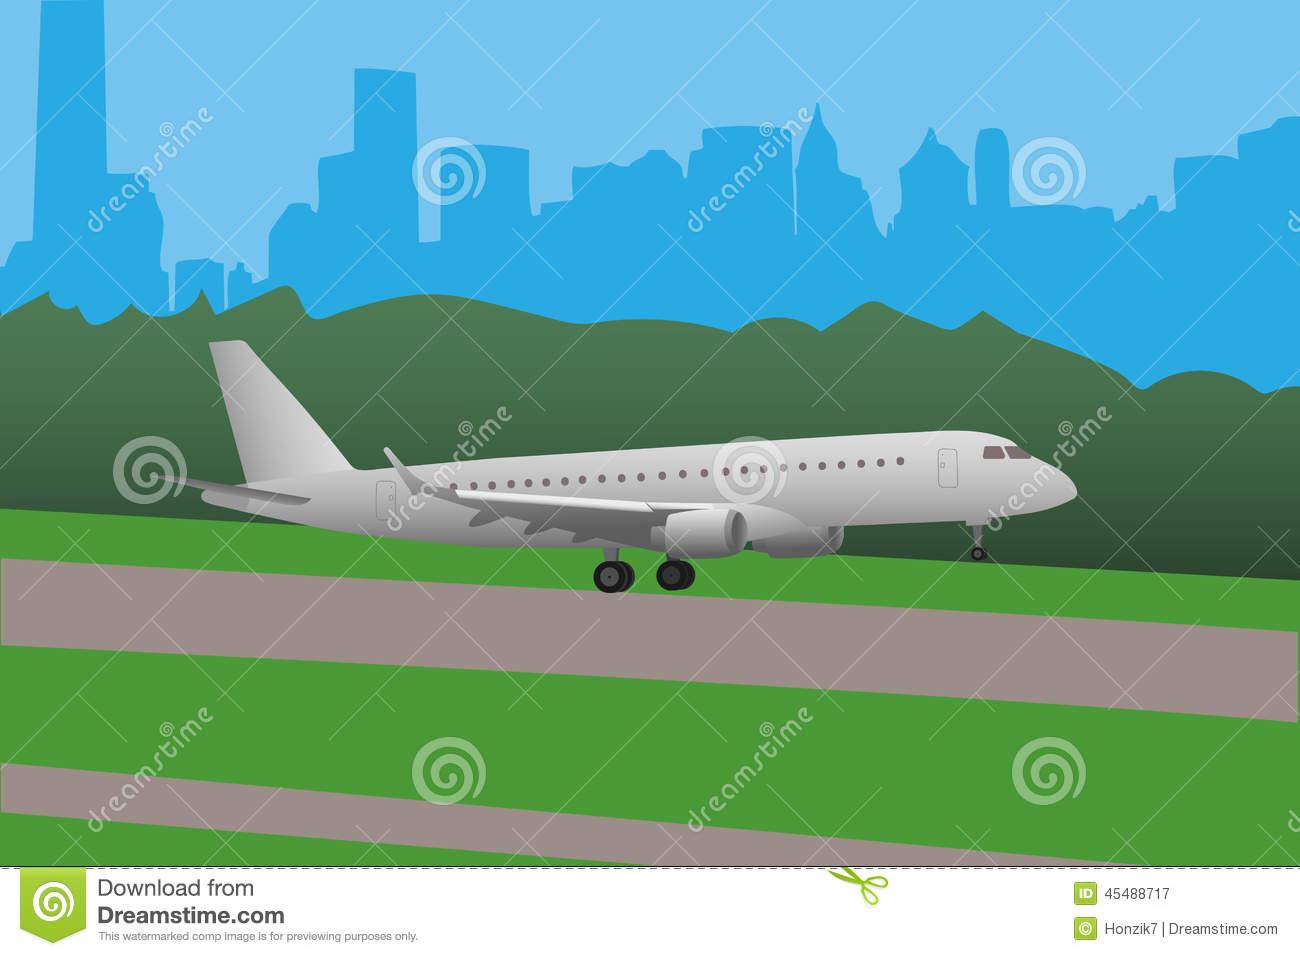 Landing plane clipart.